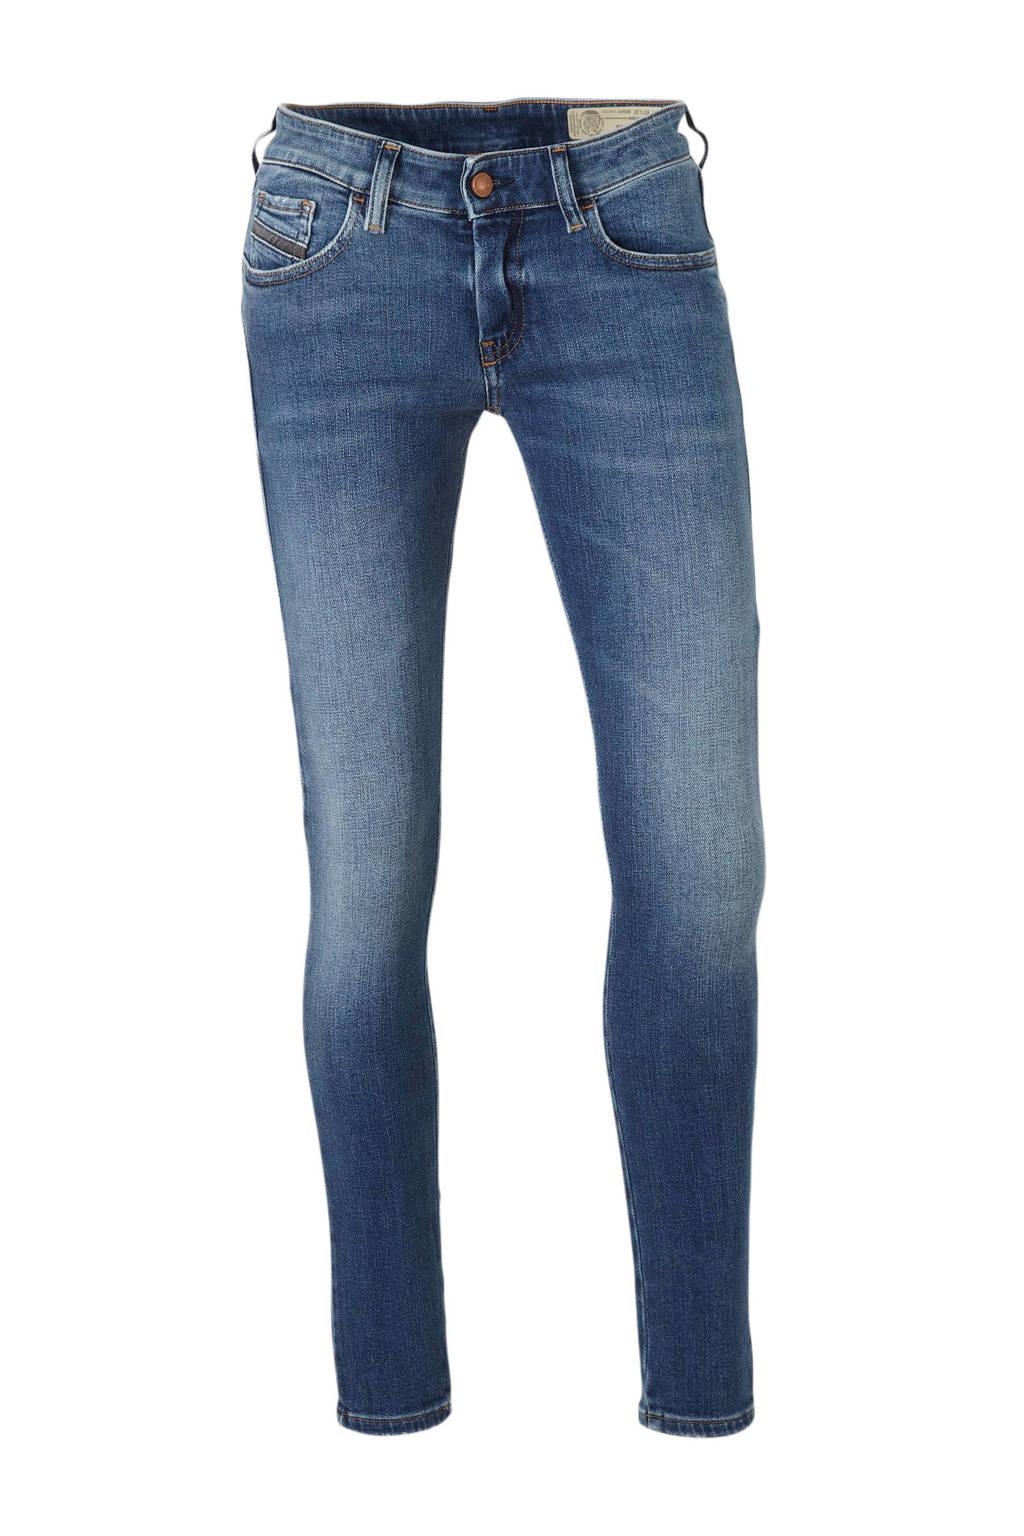 Diesel low waist super skinny jeans Slandy blauw, 32